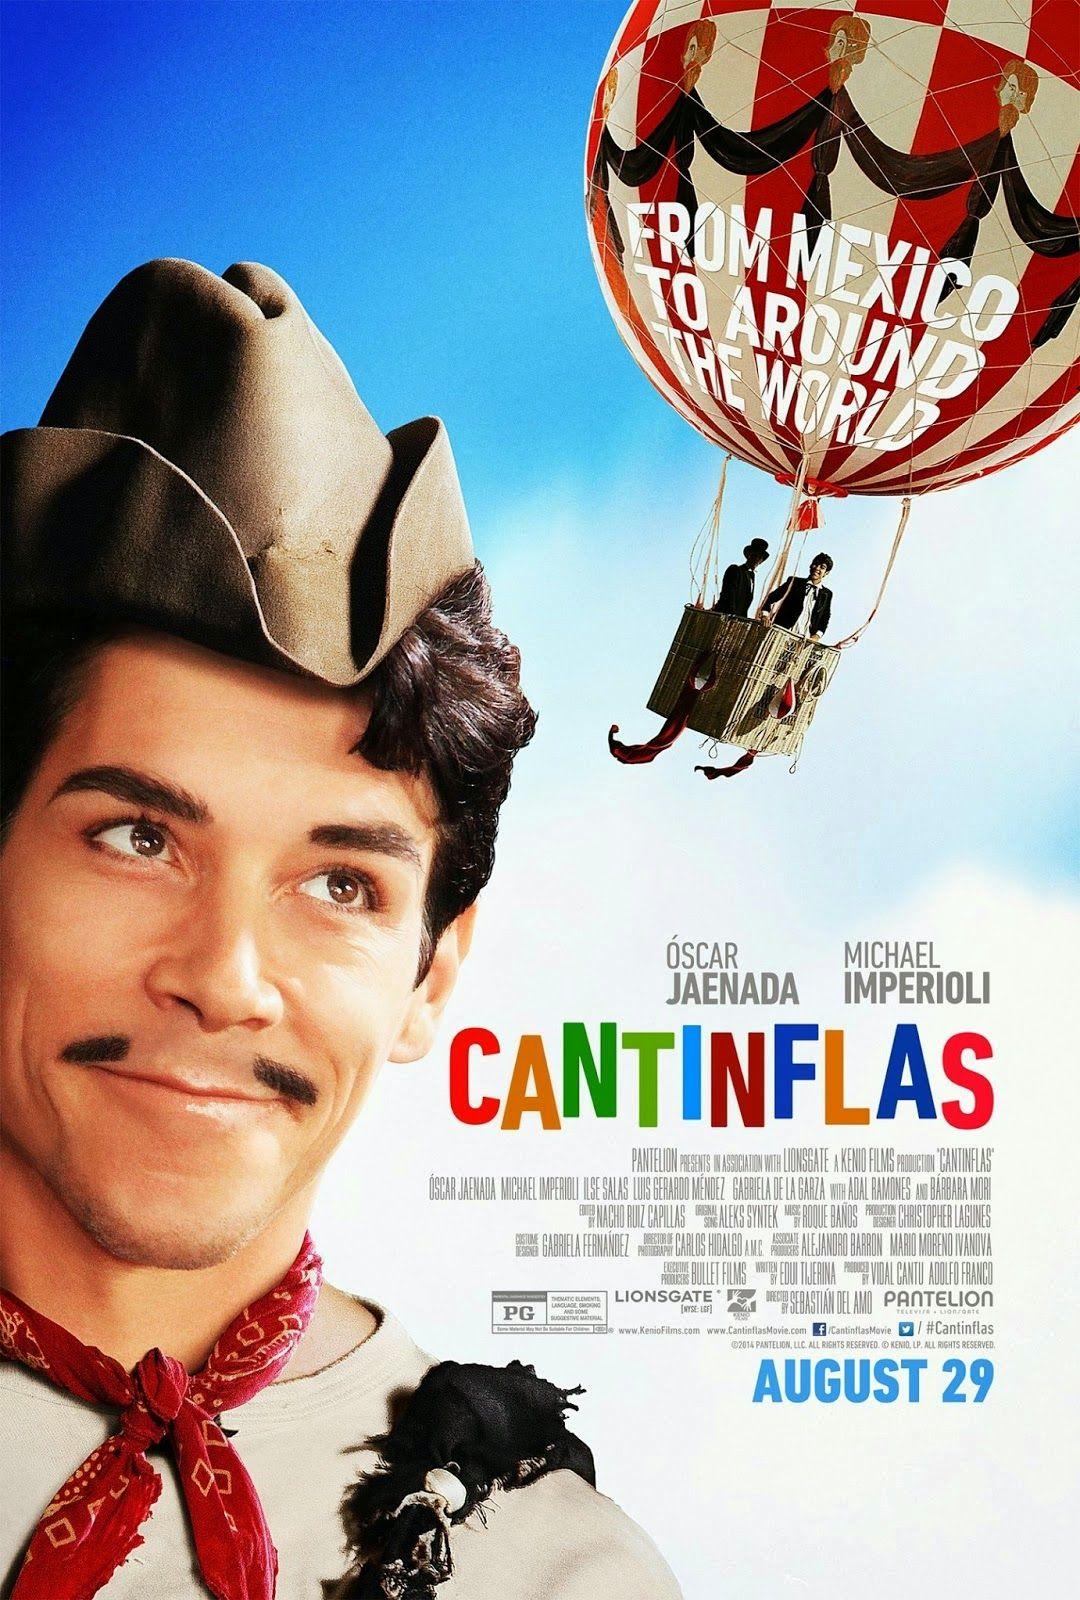 Cantinflas Cantinflas 2014 Cantinflas Cantinflas La Pelicula